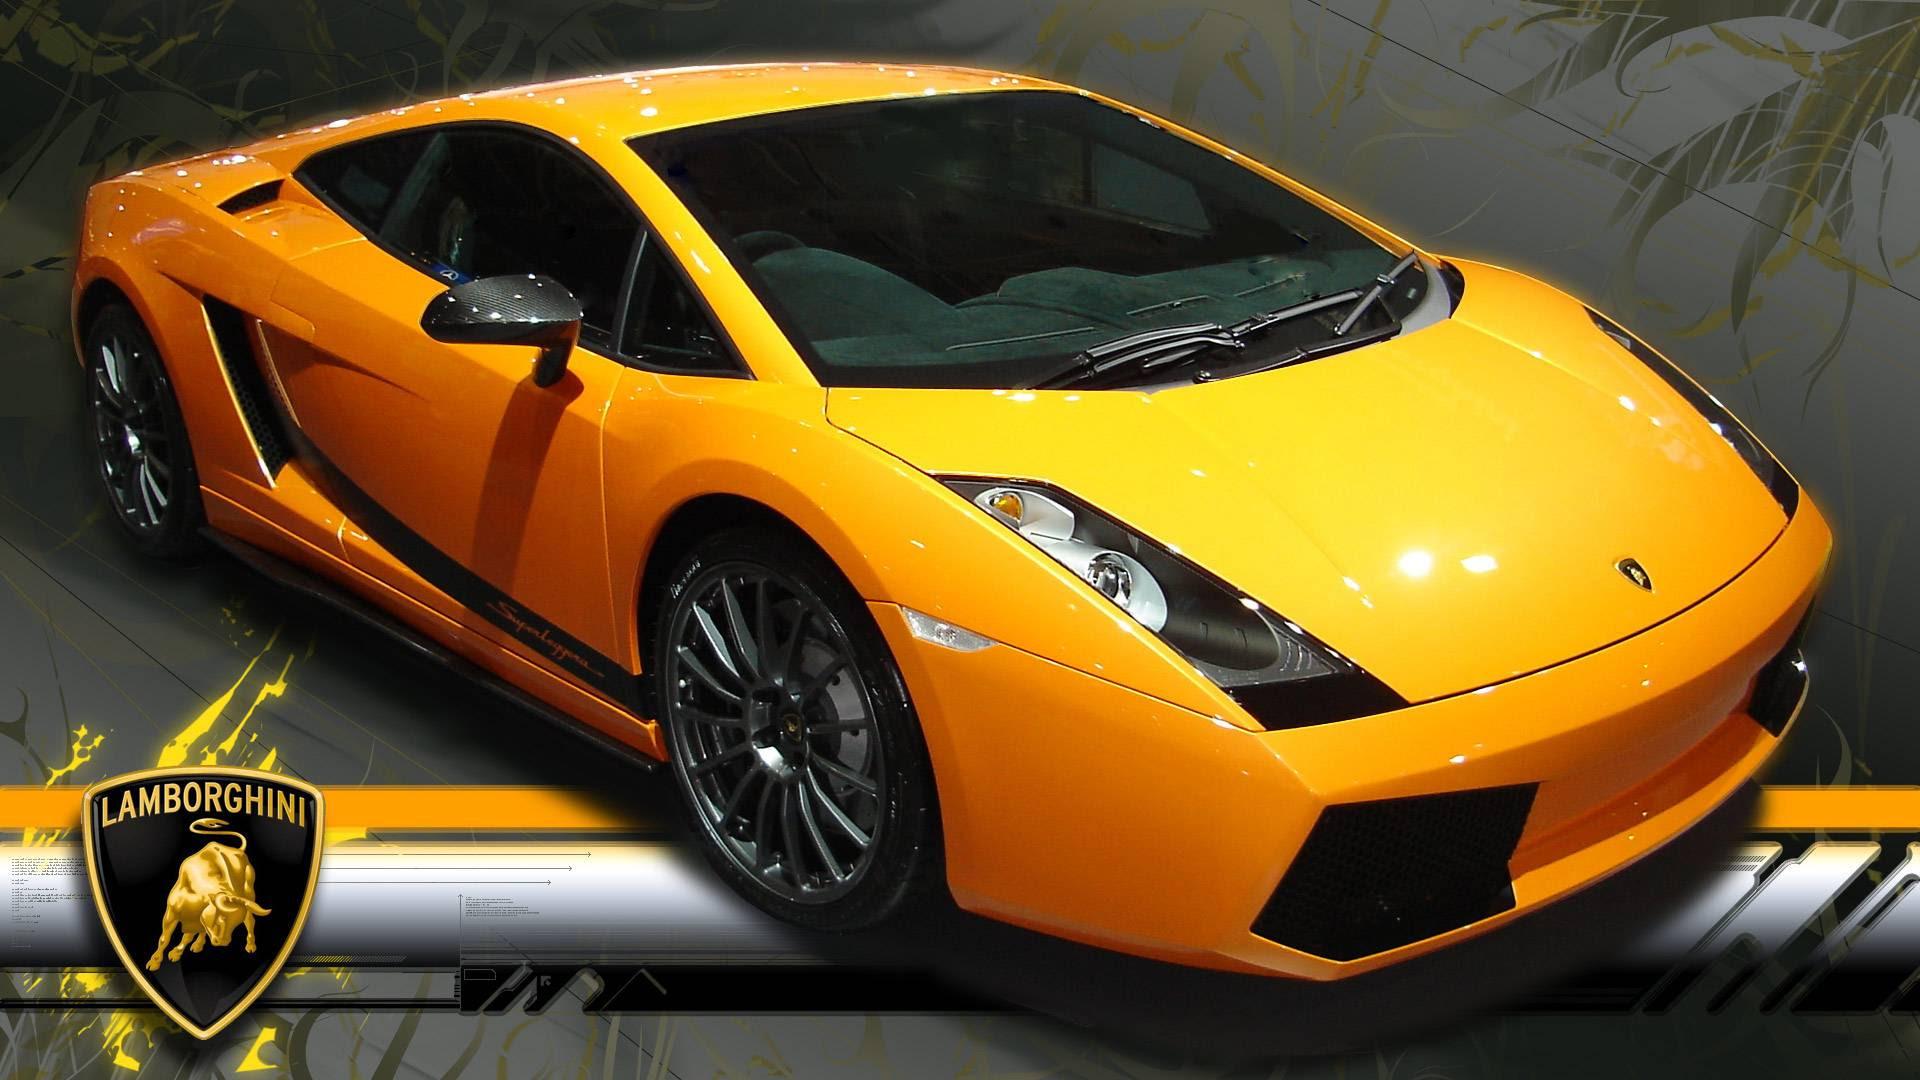 Lamborghini Gallardo 2015 Gold Aventador Wallpaper